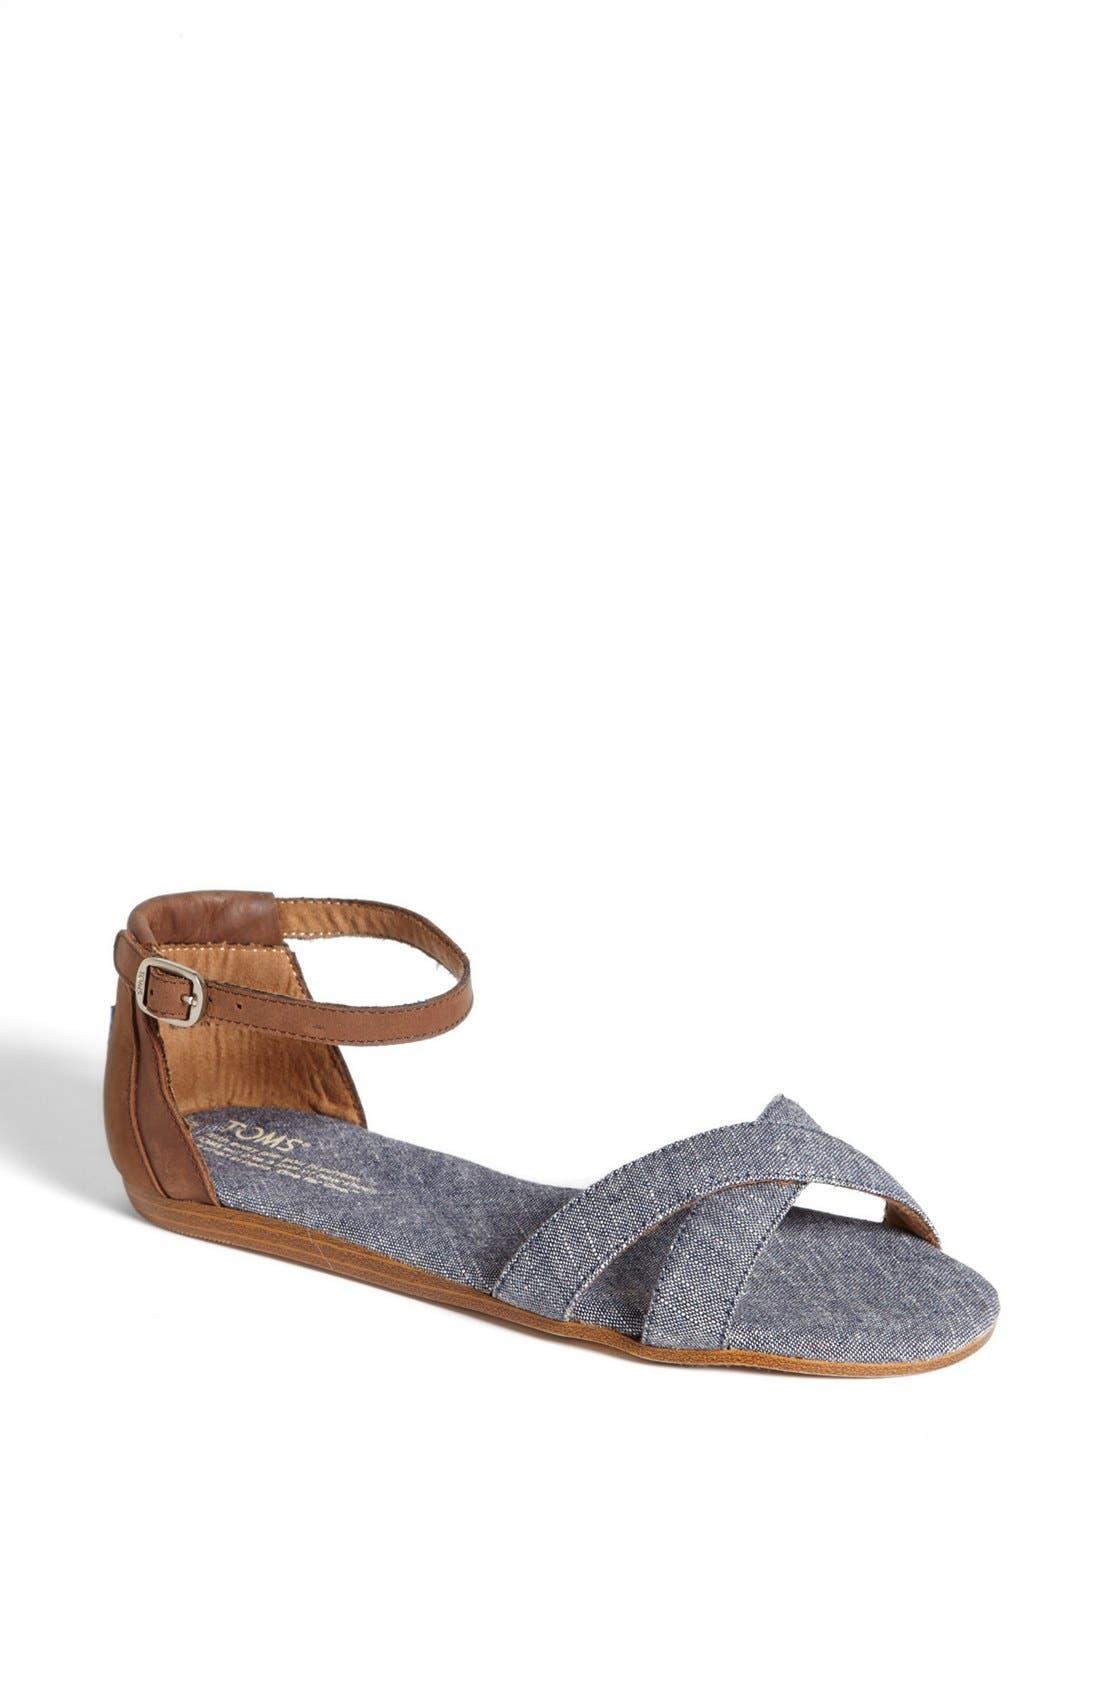 Alternate Image 1 Selected - TOMS 'Correa' Ankle Strap Flat Sandal